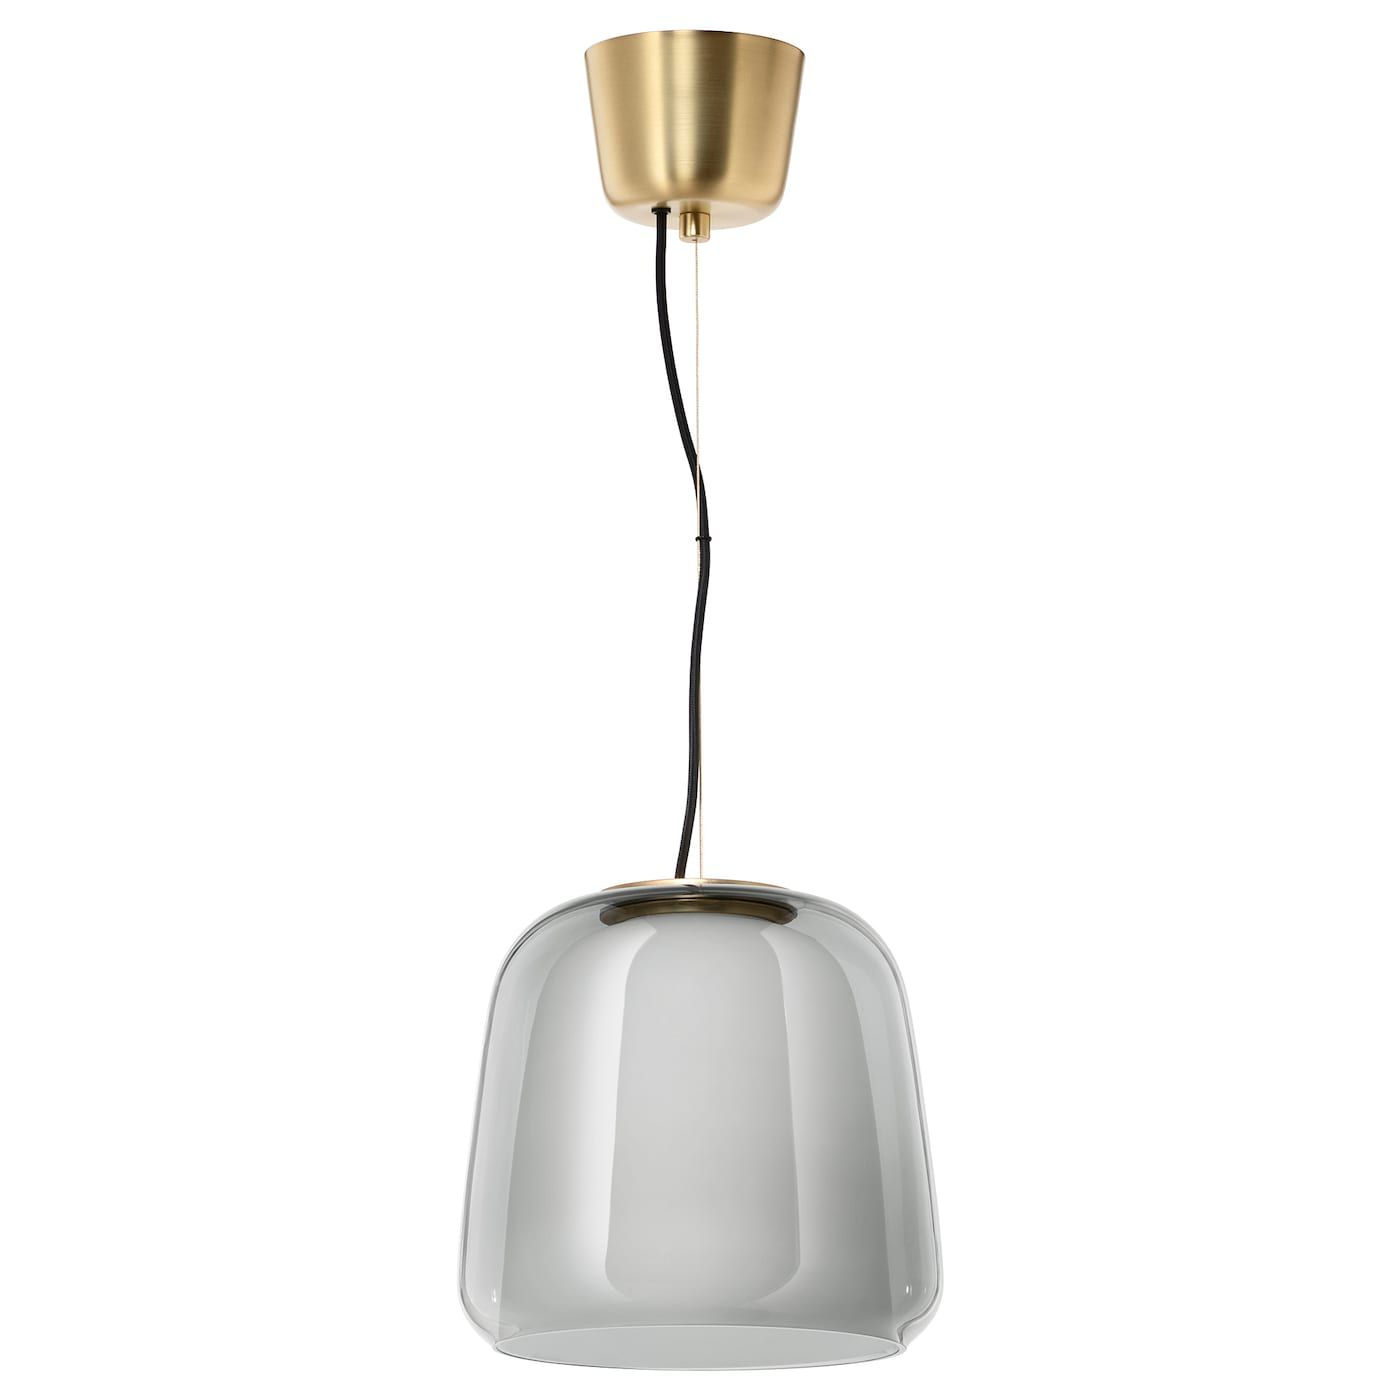 EVEDAL Hanglamp grijs in 2020 | Hanglamp, Plafondlamp